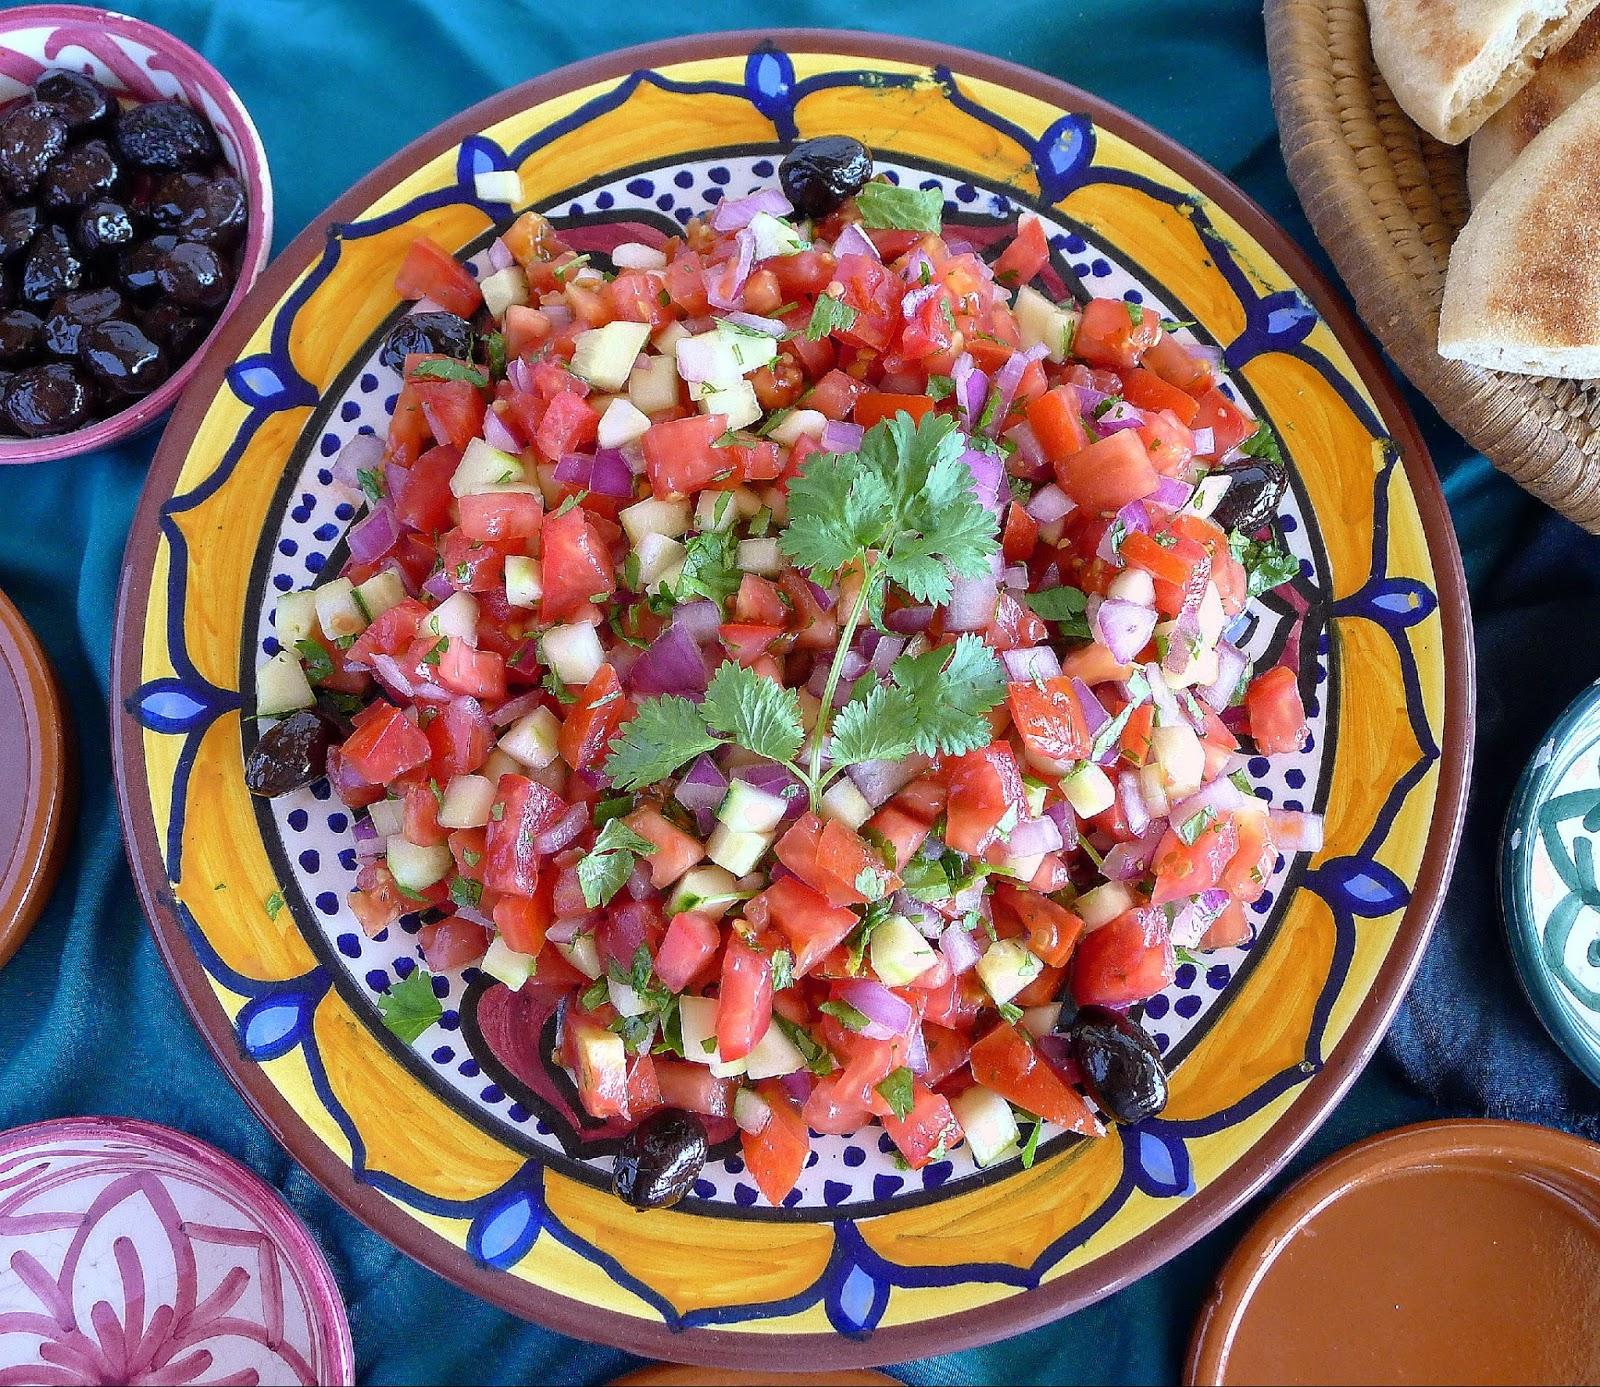 Moroccan Dinner Plate Salad Pasta Bowl Serving Spain White Black 10 Inch Medium